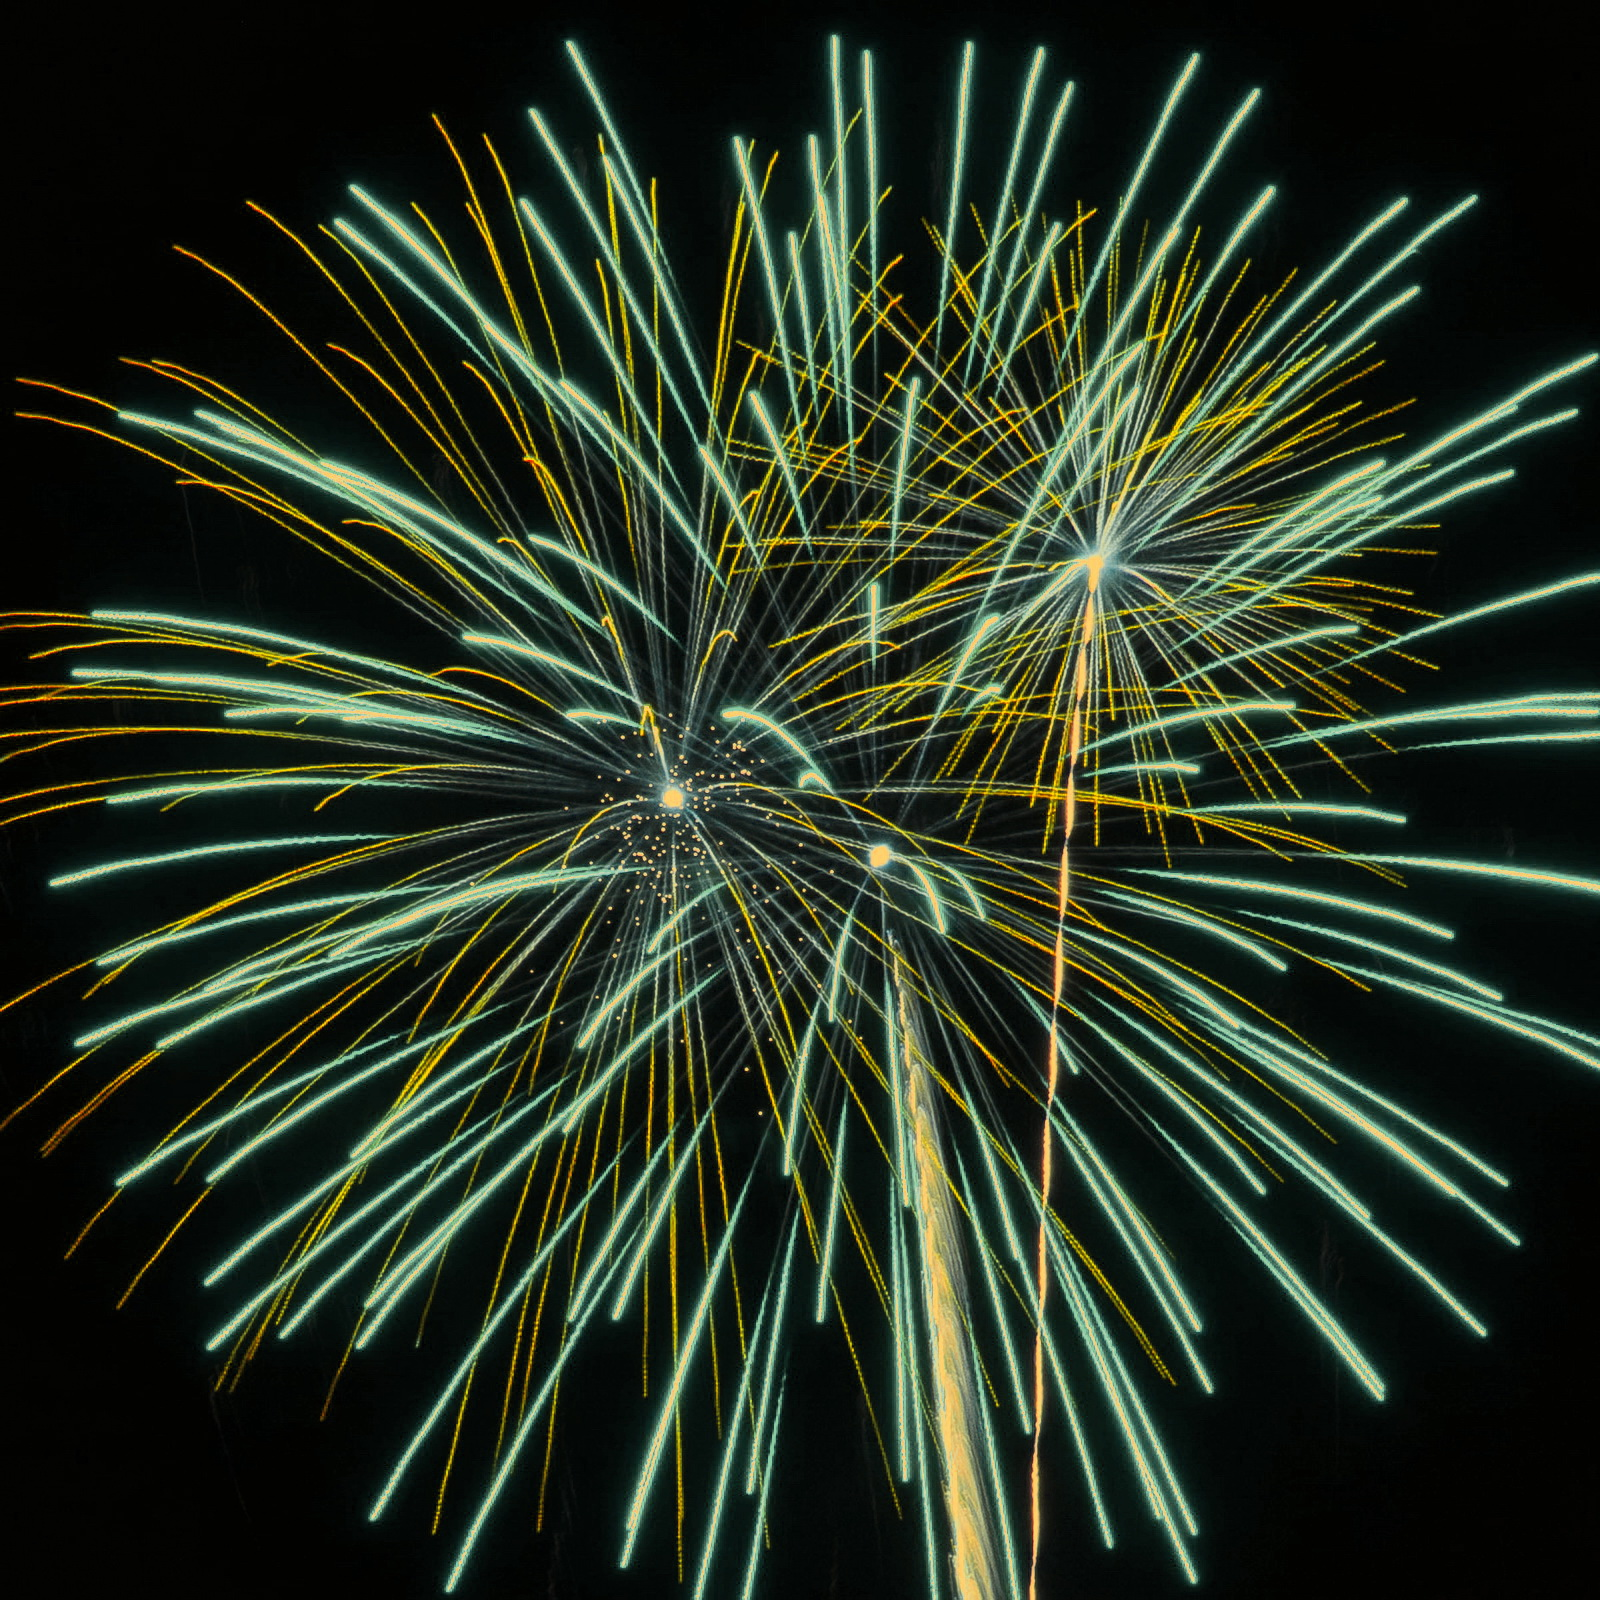 Massachusetts Fireworks: Unusual Green and yellow